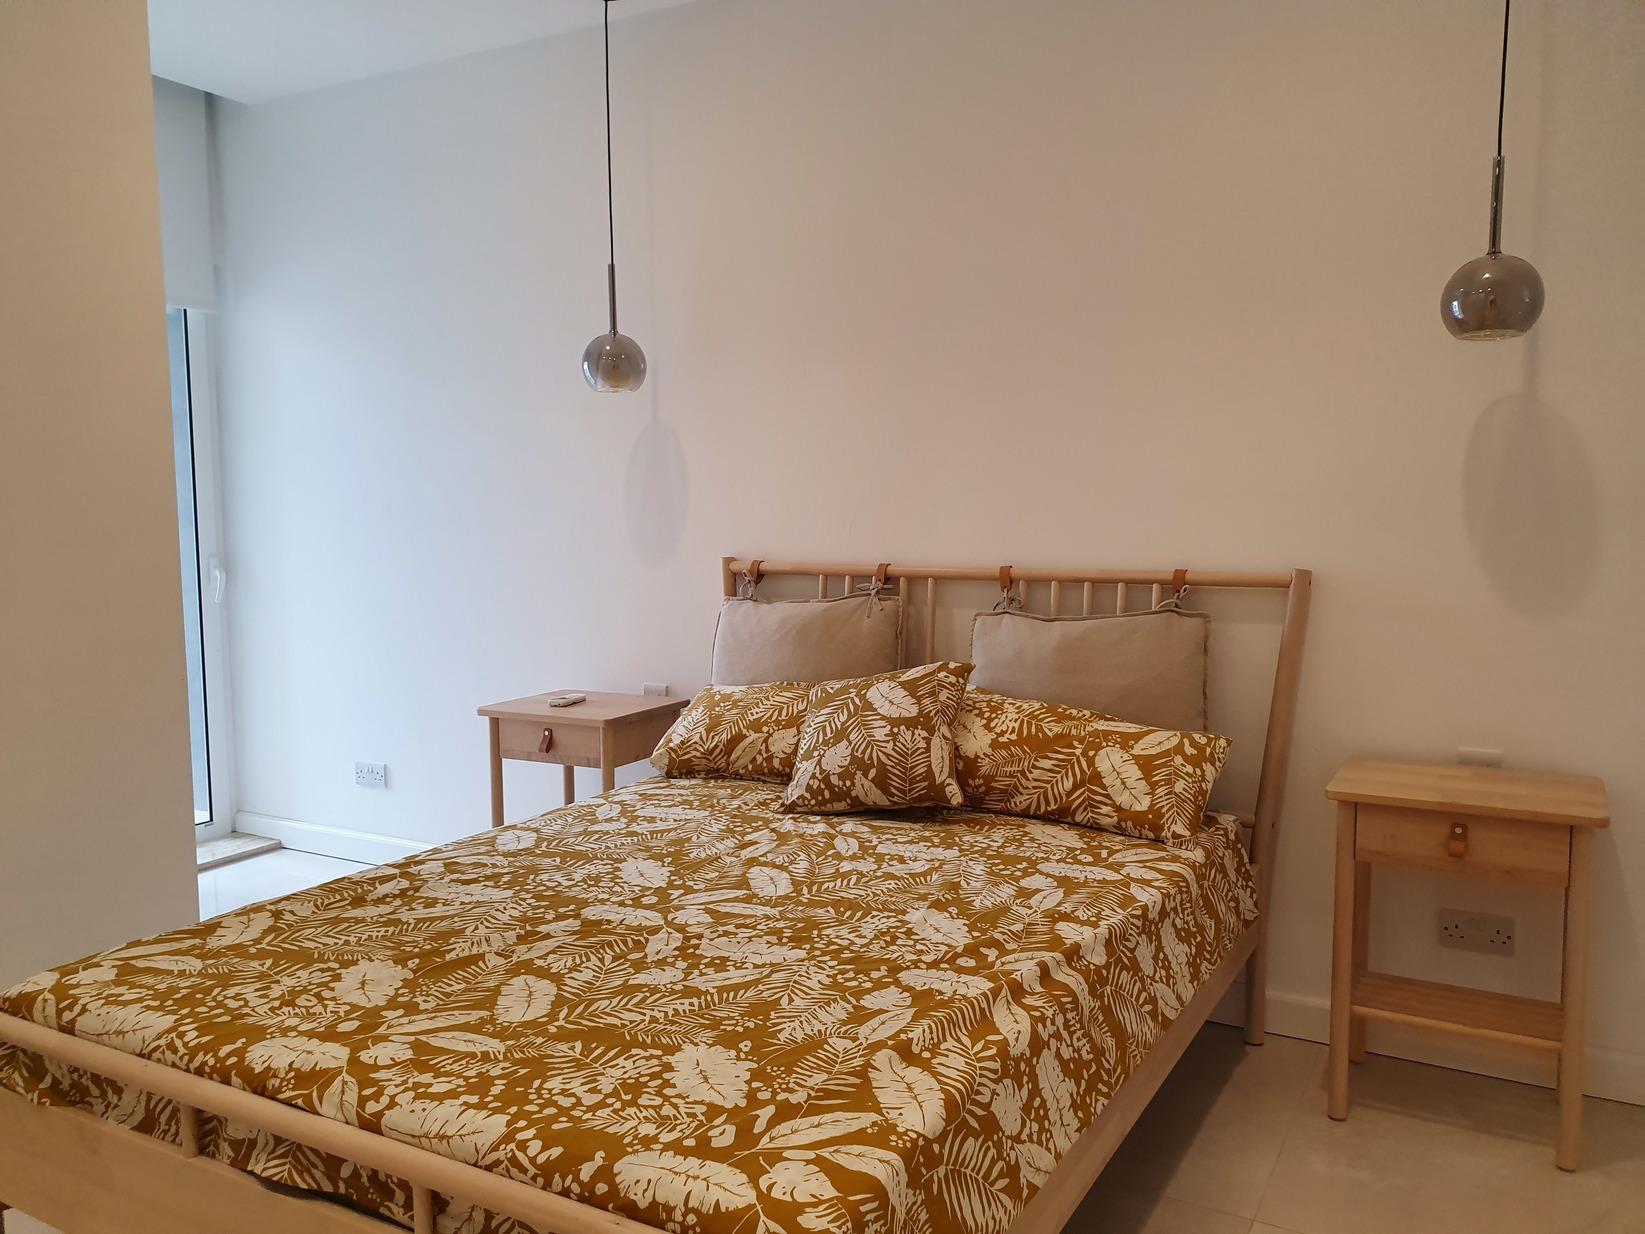 4 bed Apartment For Rent in Sliema, Sliema - thumb 13